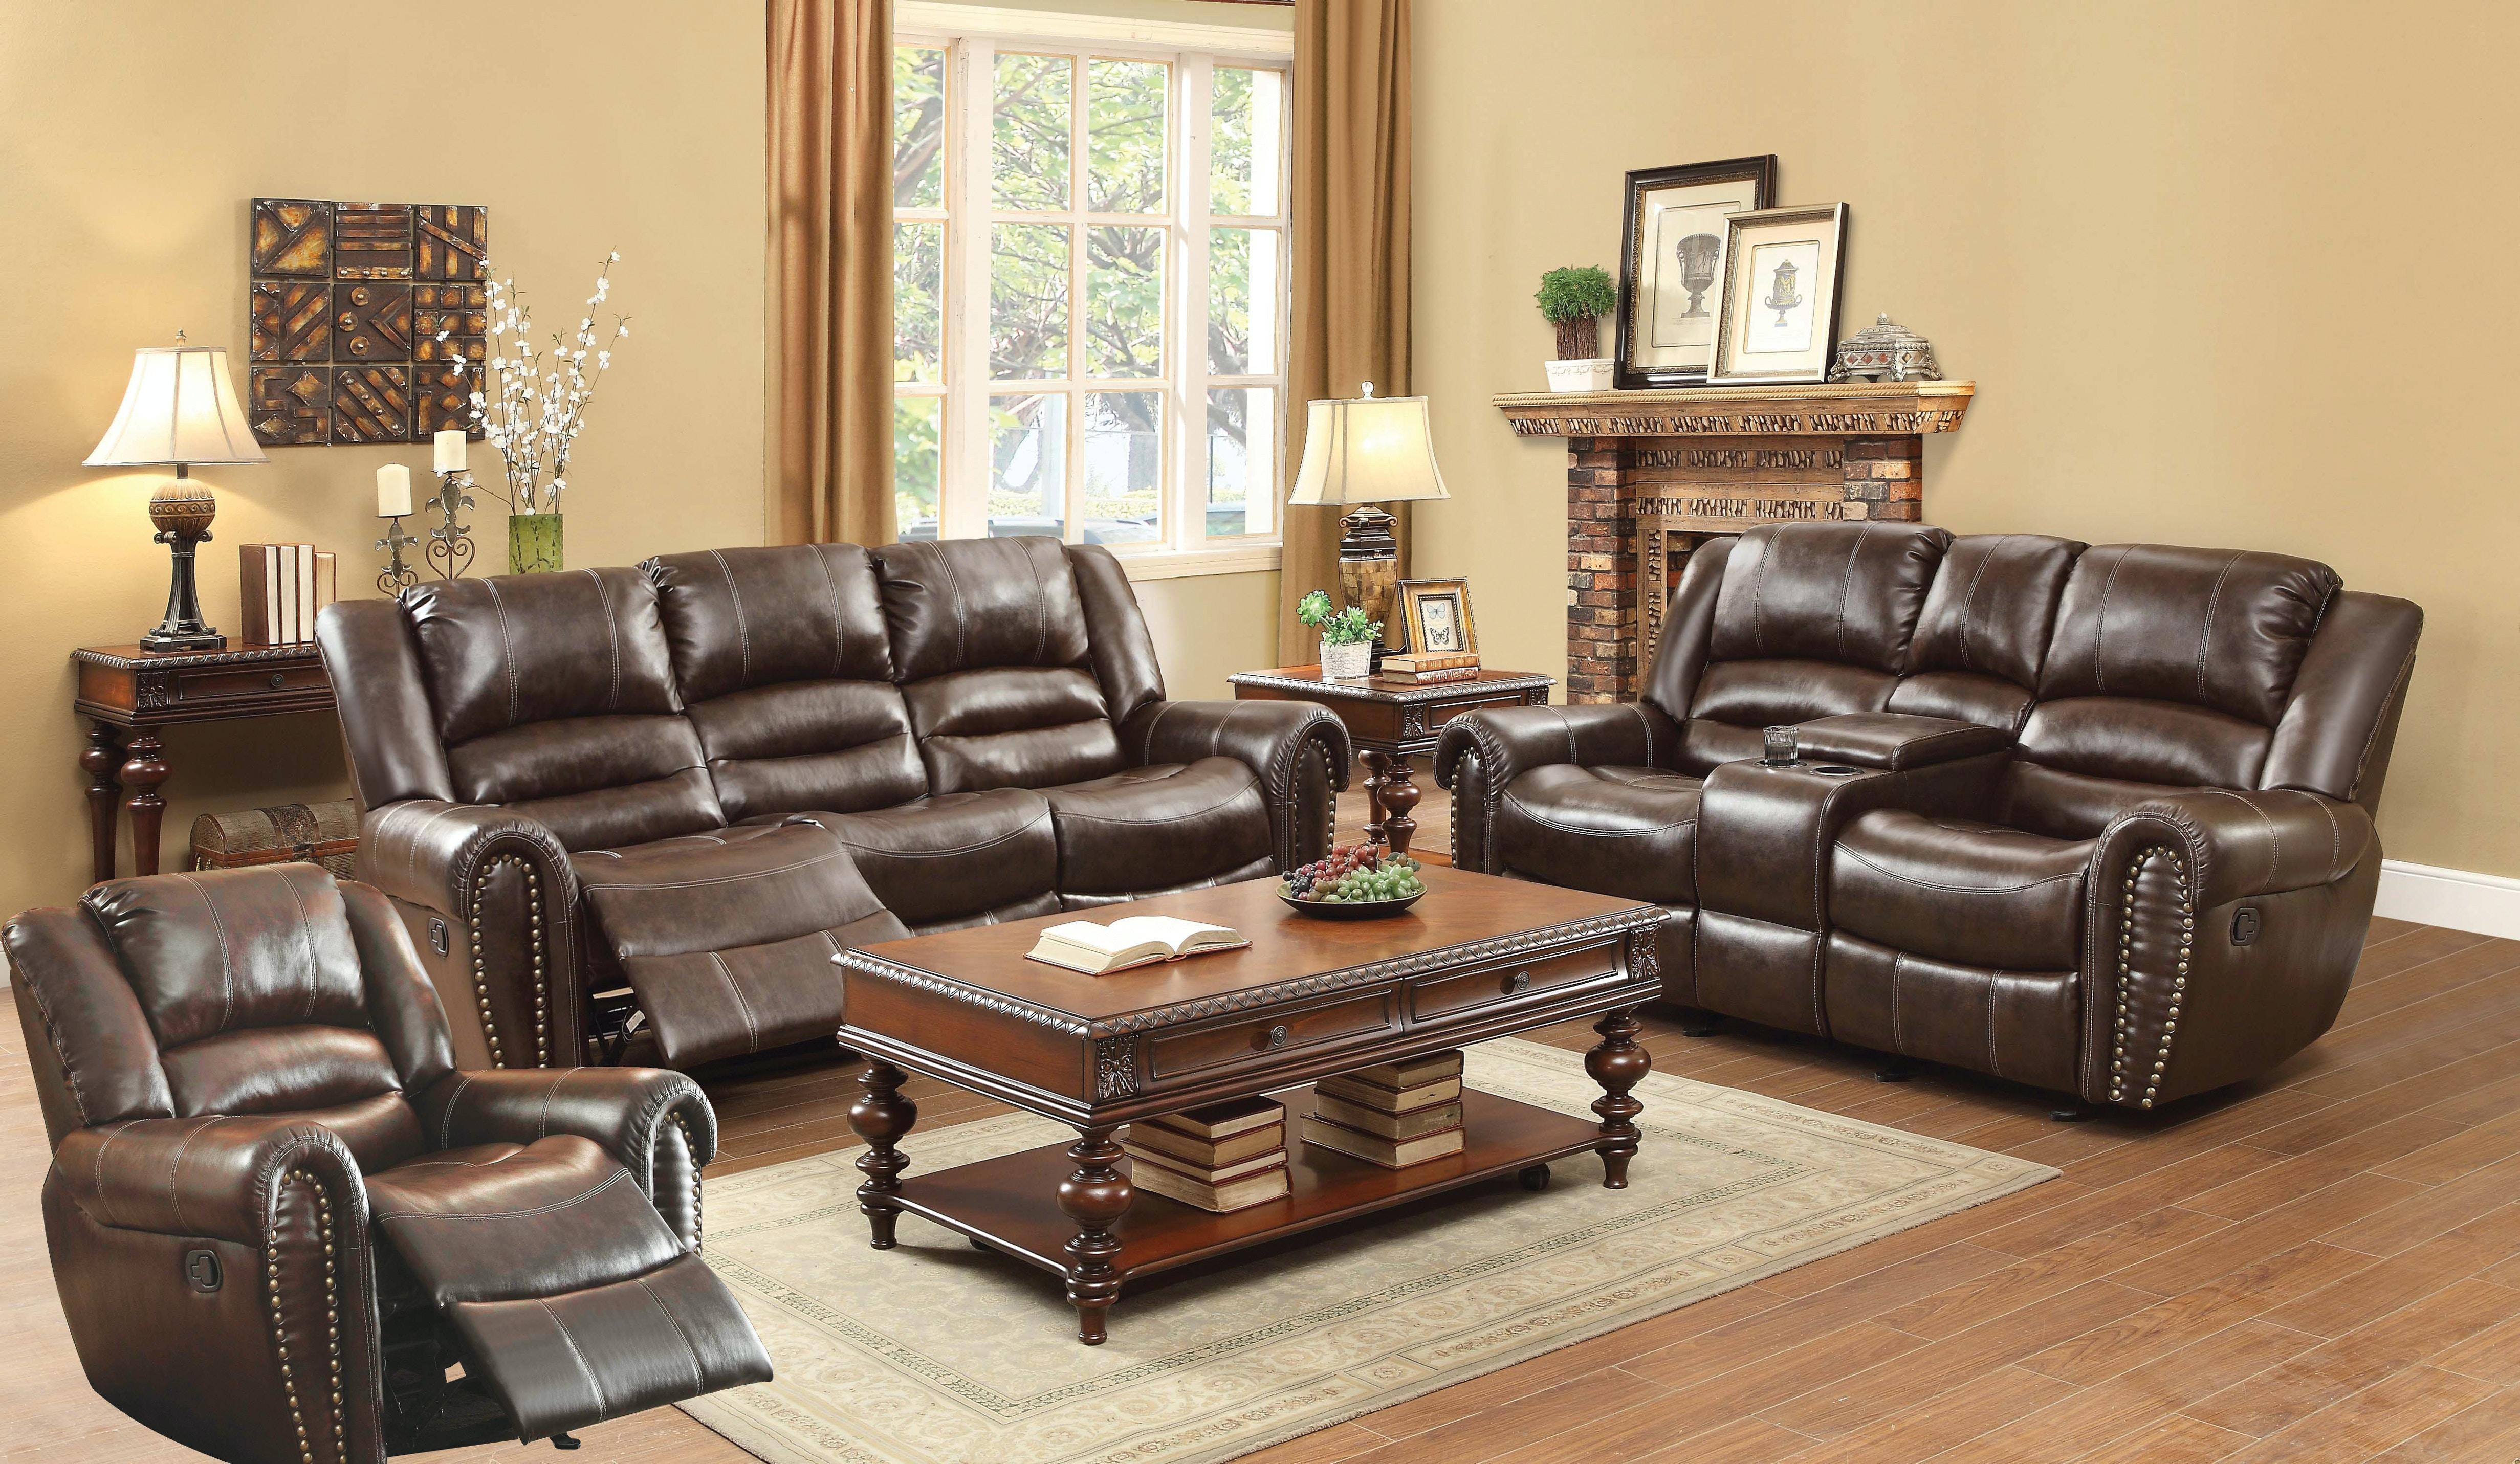 Homelegance Dallas Living Room Group 119388